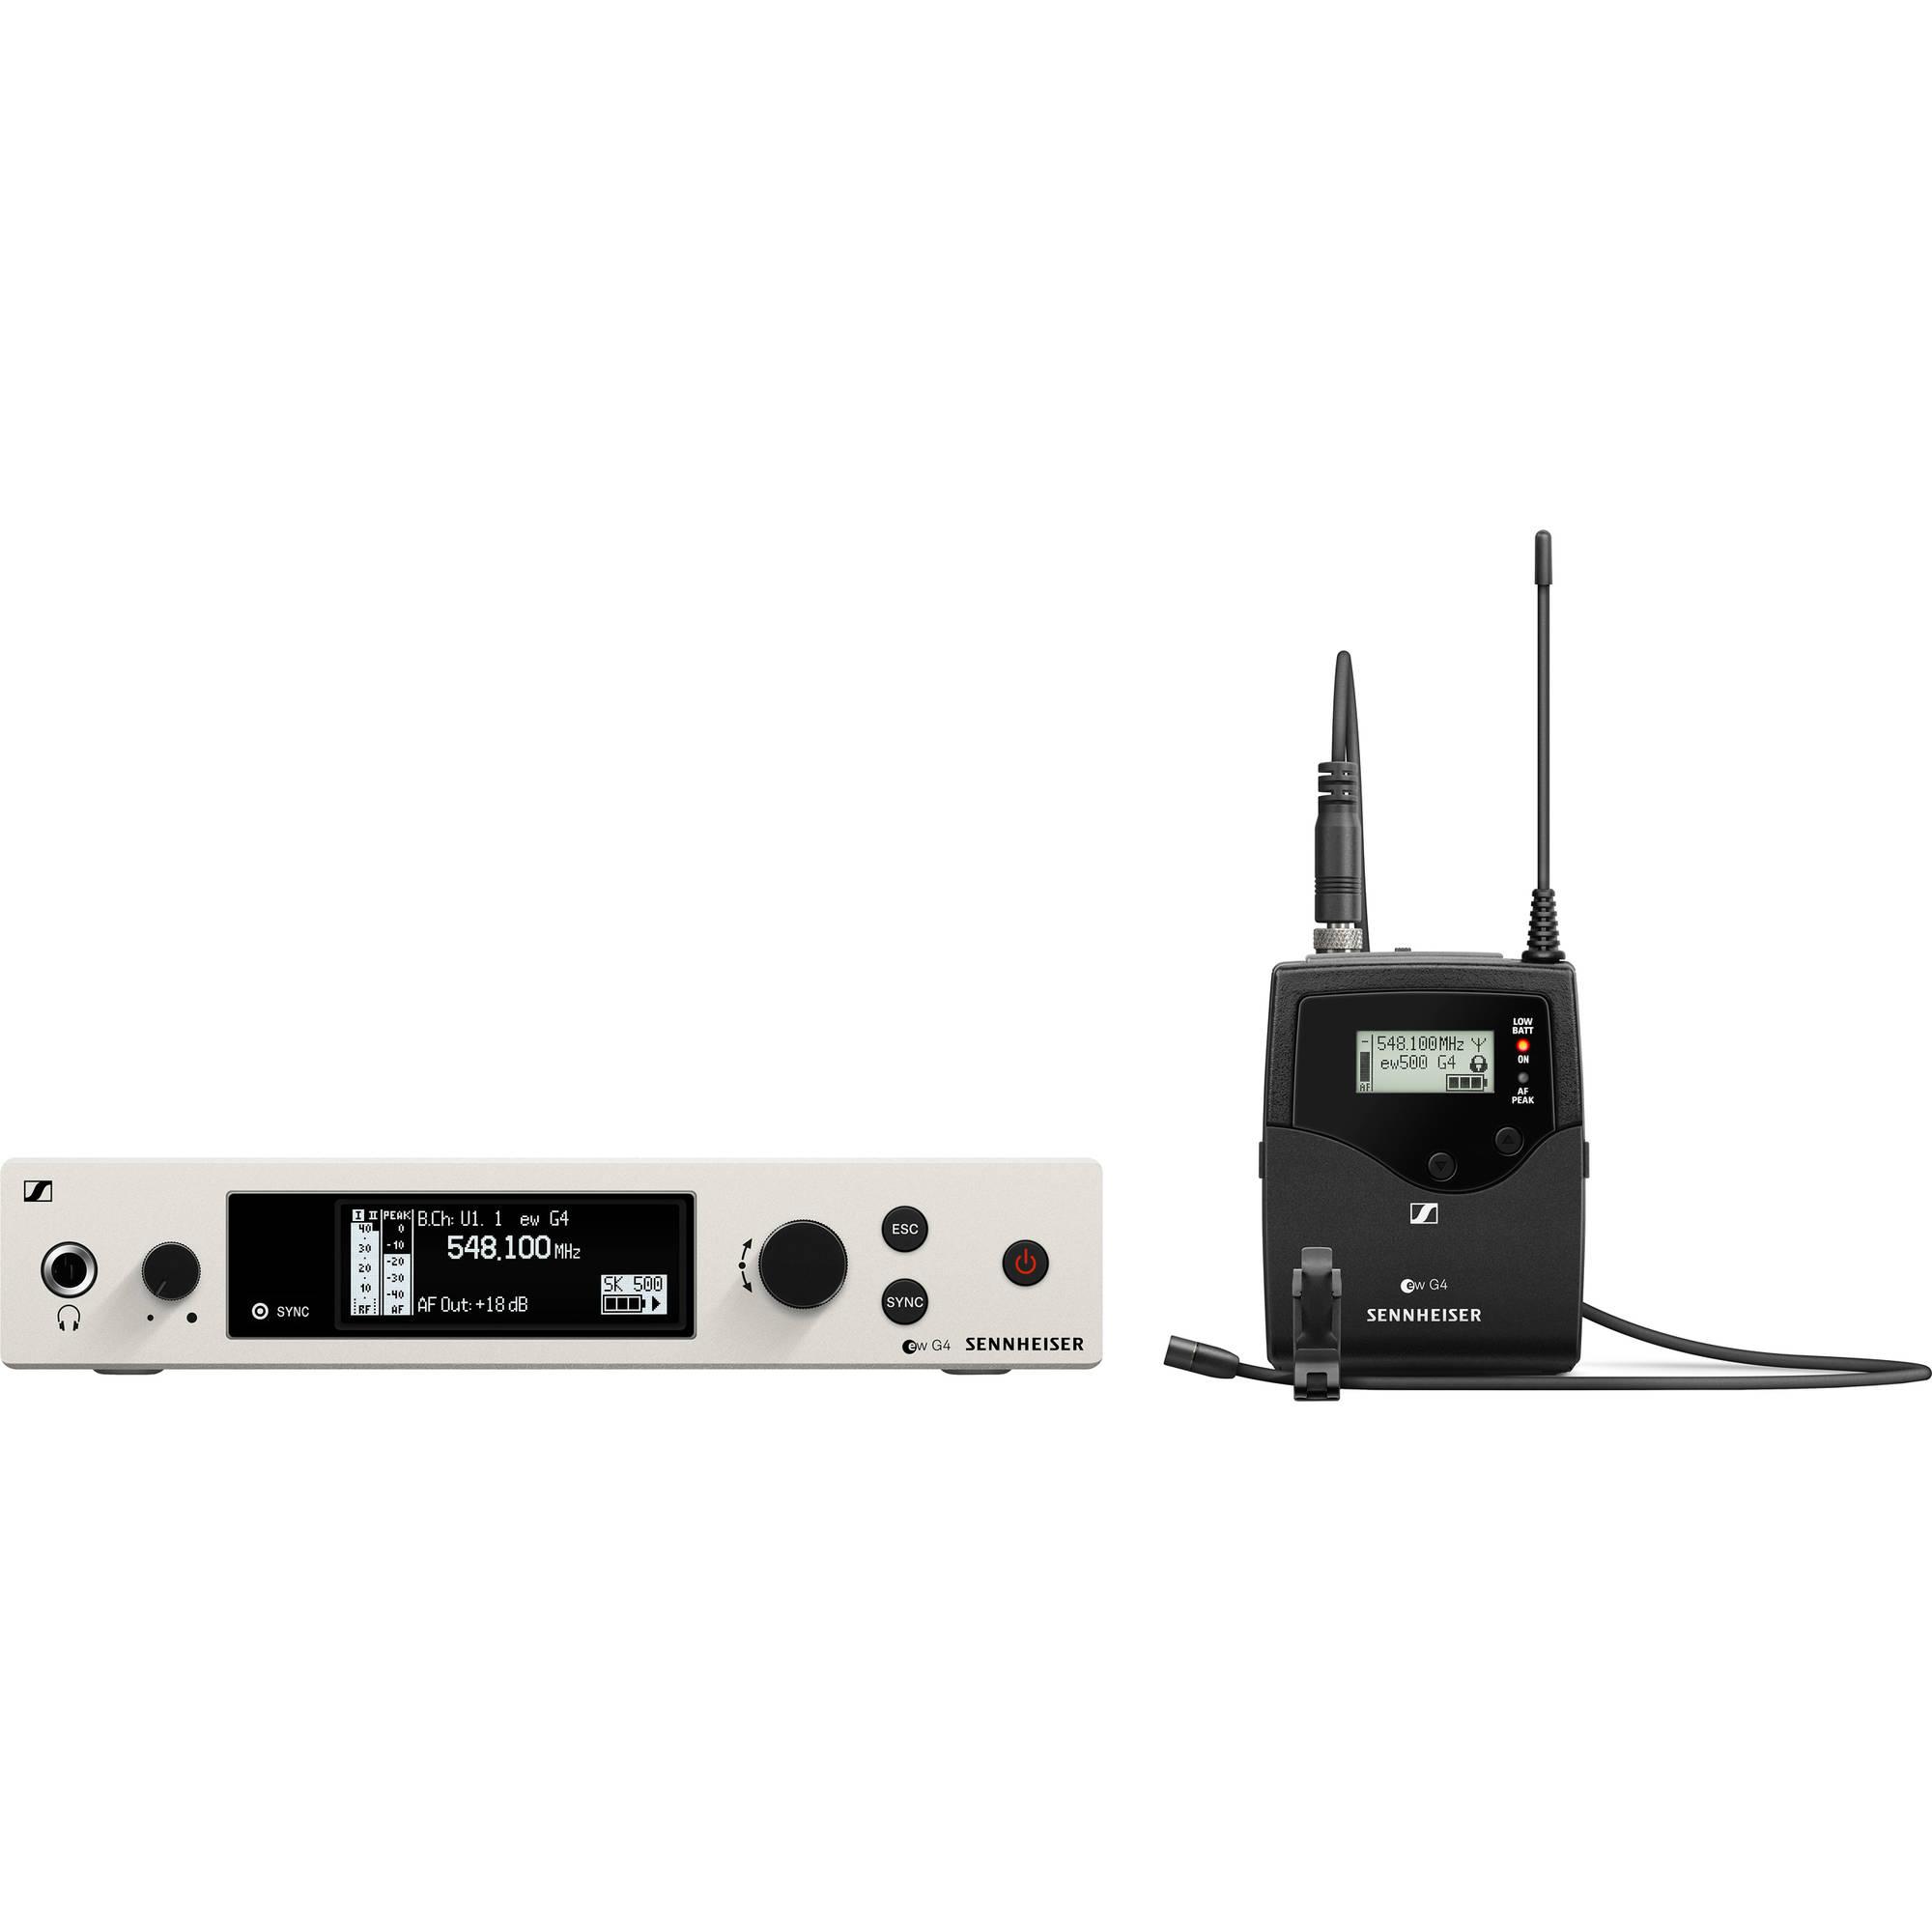 Sennheiser EW 500 G4-MKE2 Wireless Omni Lavalier Microphone System (AW+:  470 to 558 MHz)